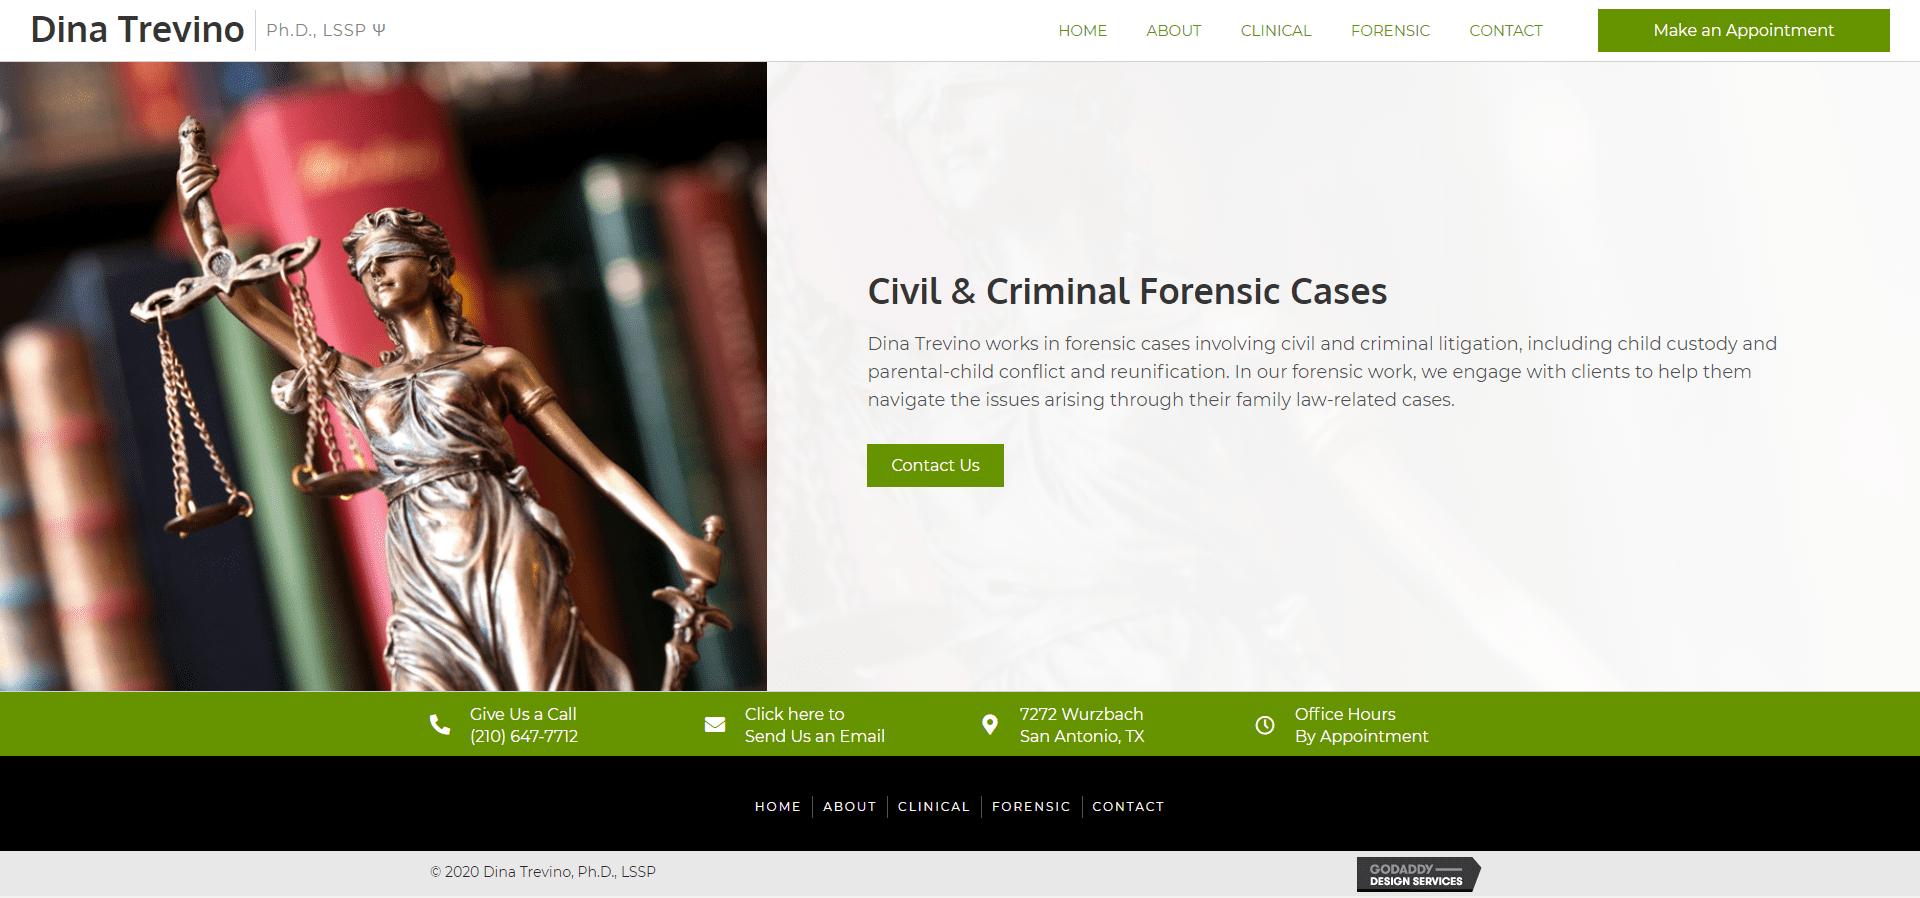 screencapture-gh8-df4-myftpupload-forensic